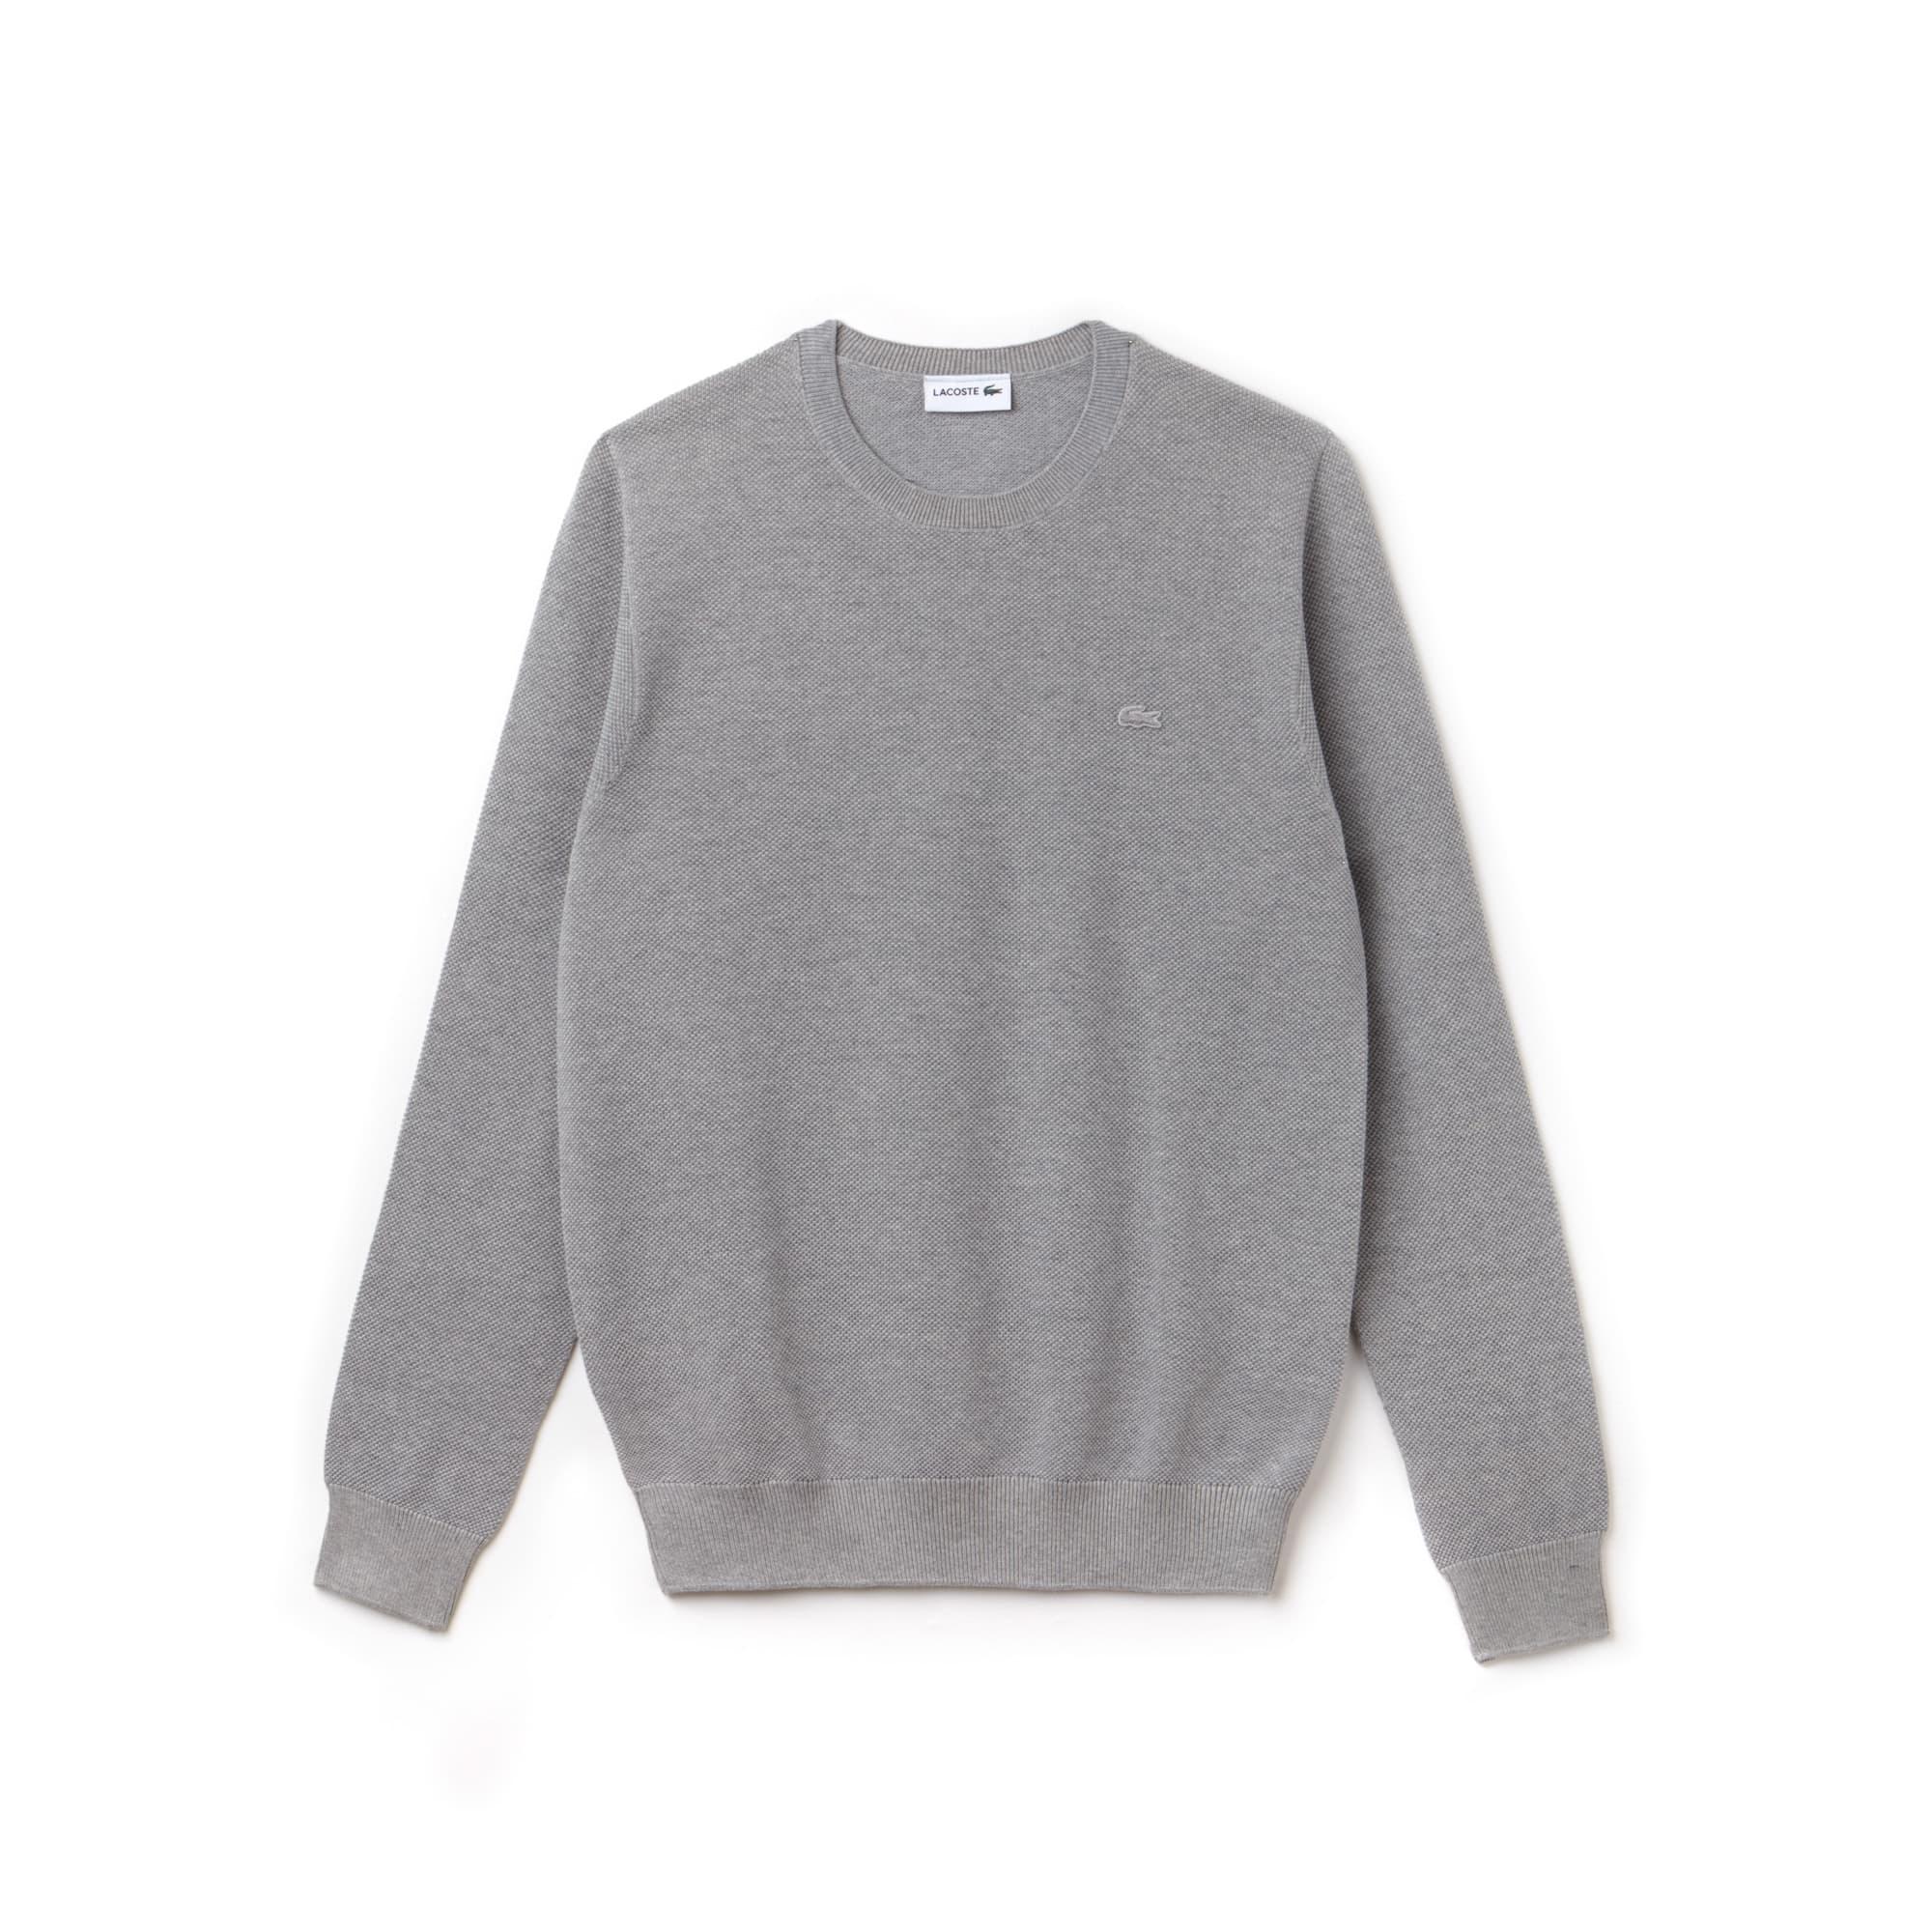 90243e4d4a3 Men's Crew Neck Cotton Piqué Sweater